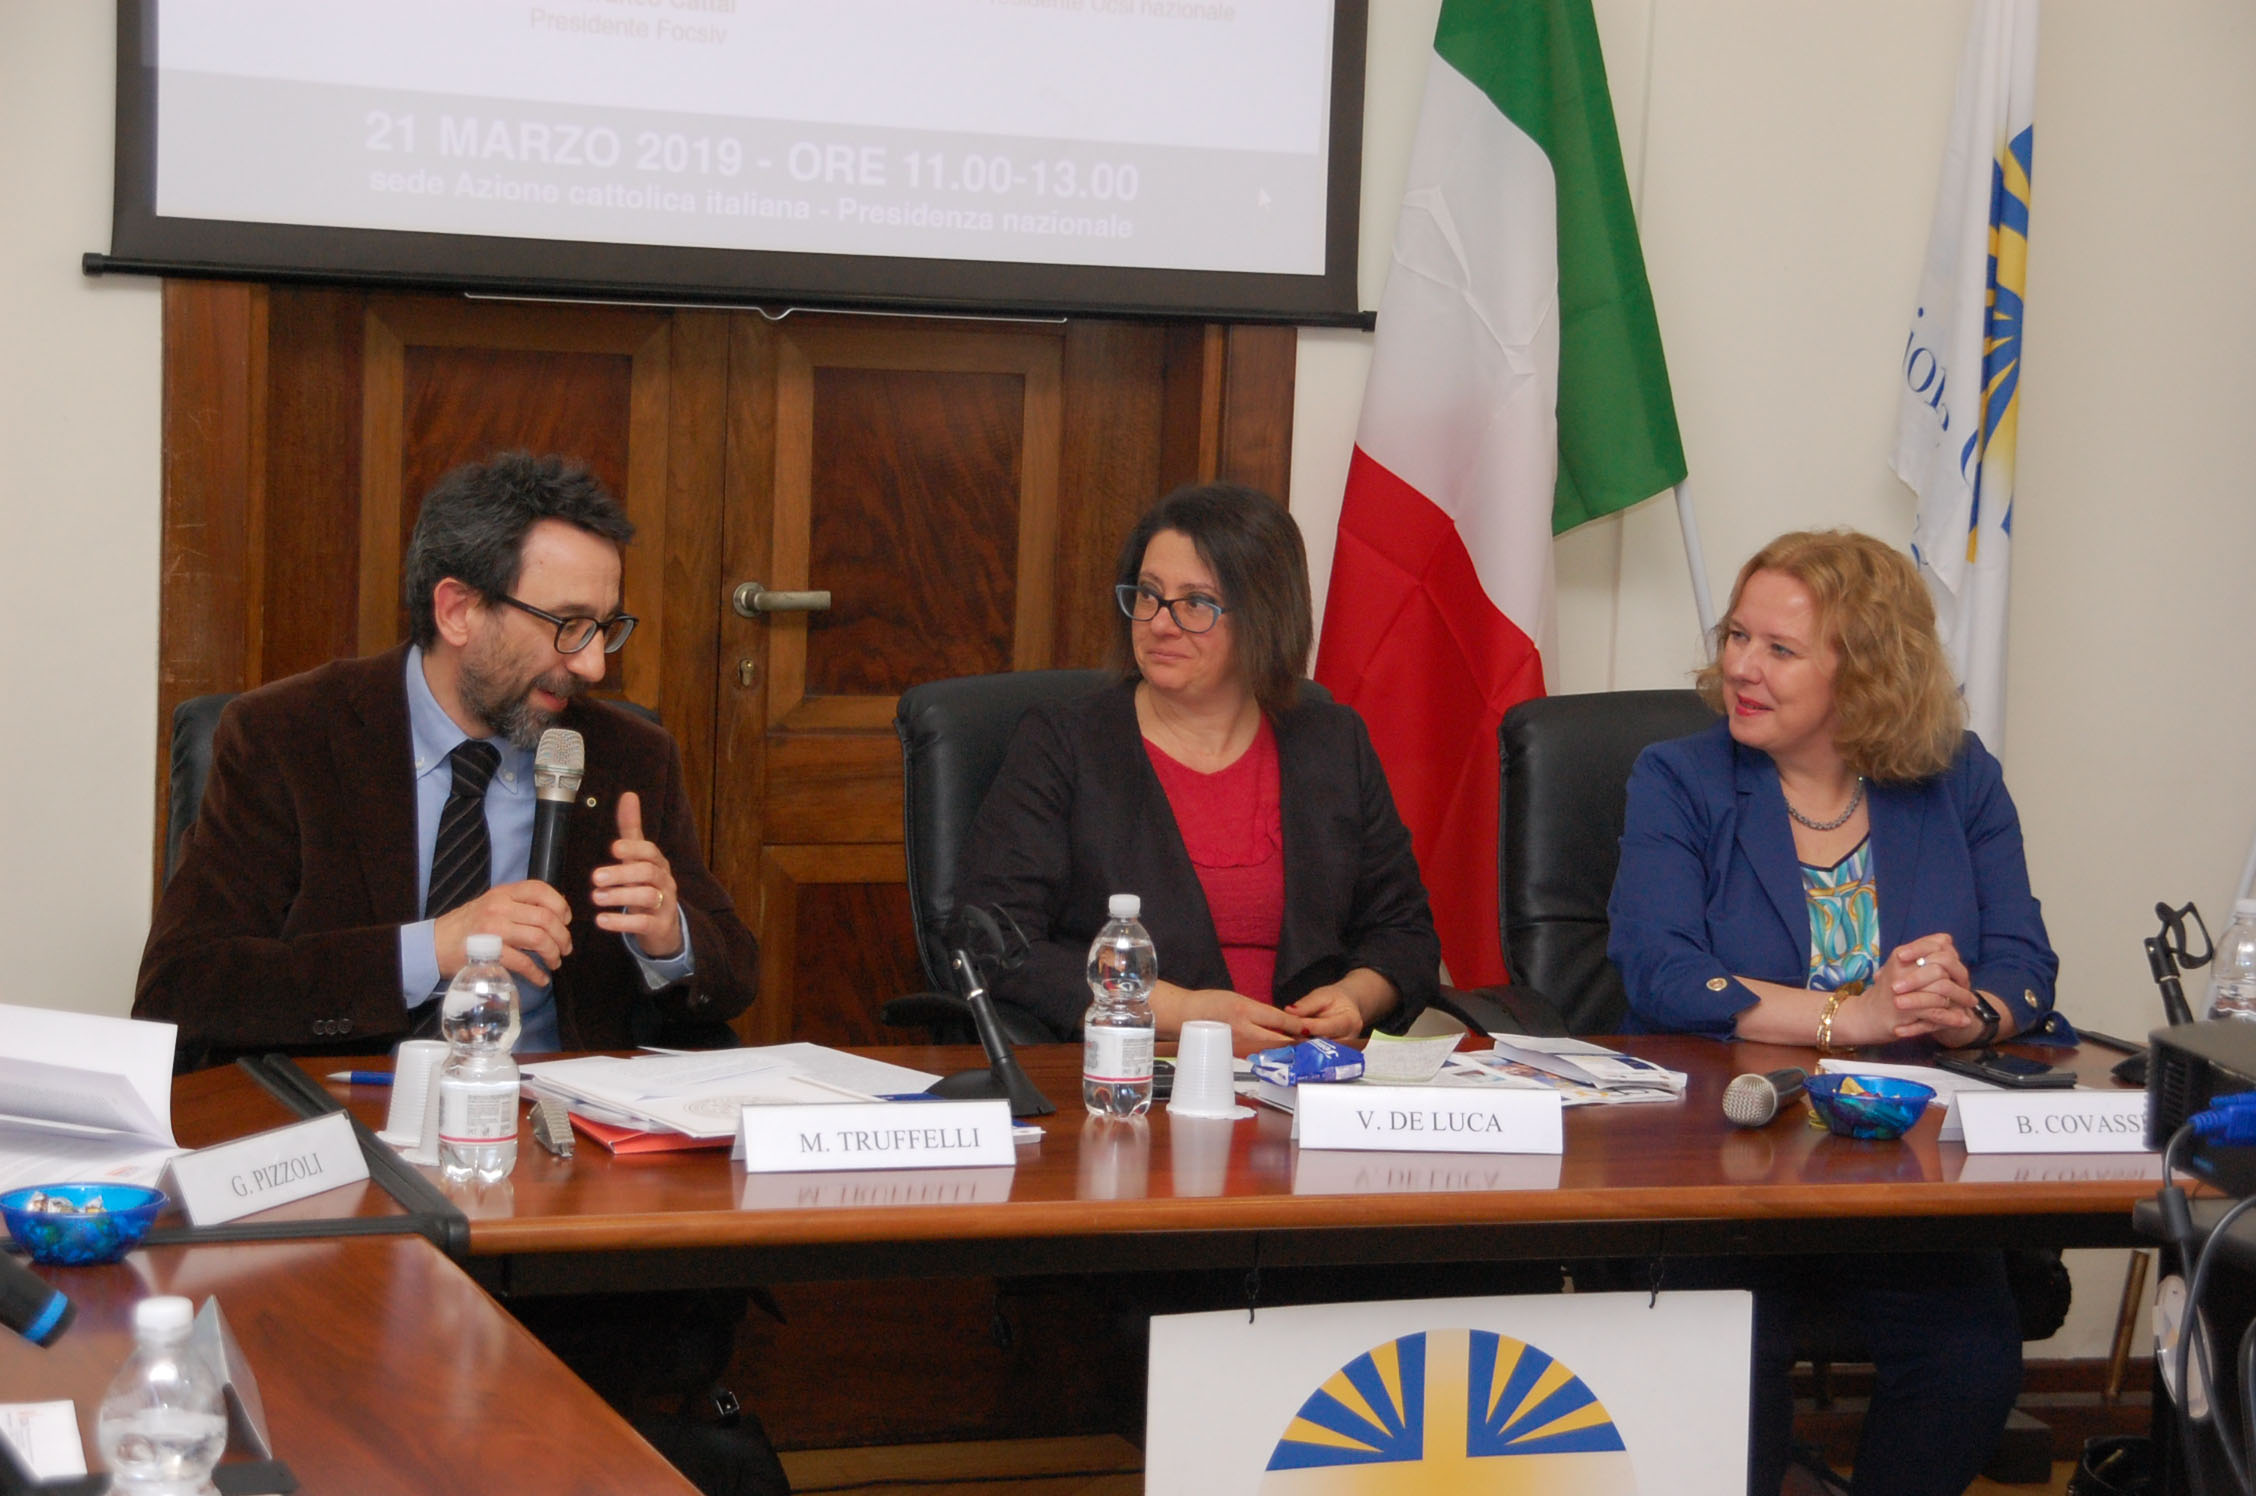 Matteo Truffelli, Vania De Luca, Beatrice Covassi